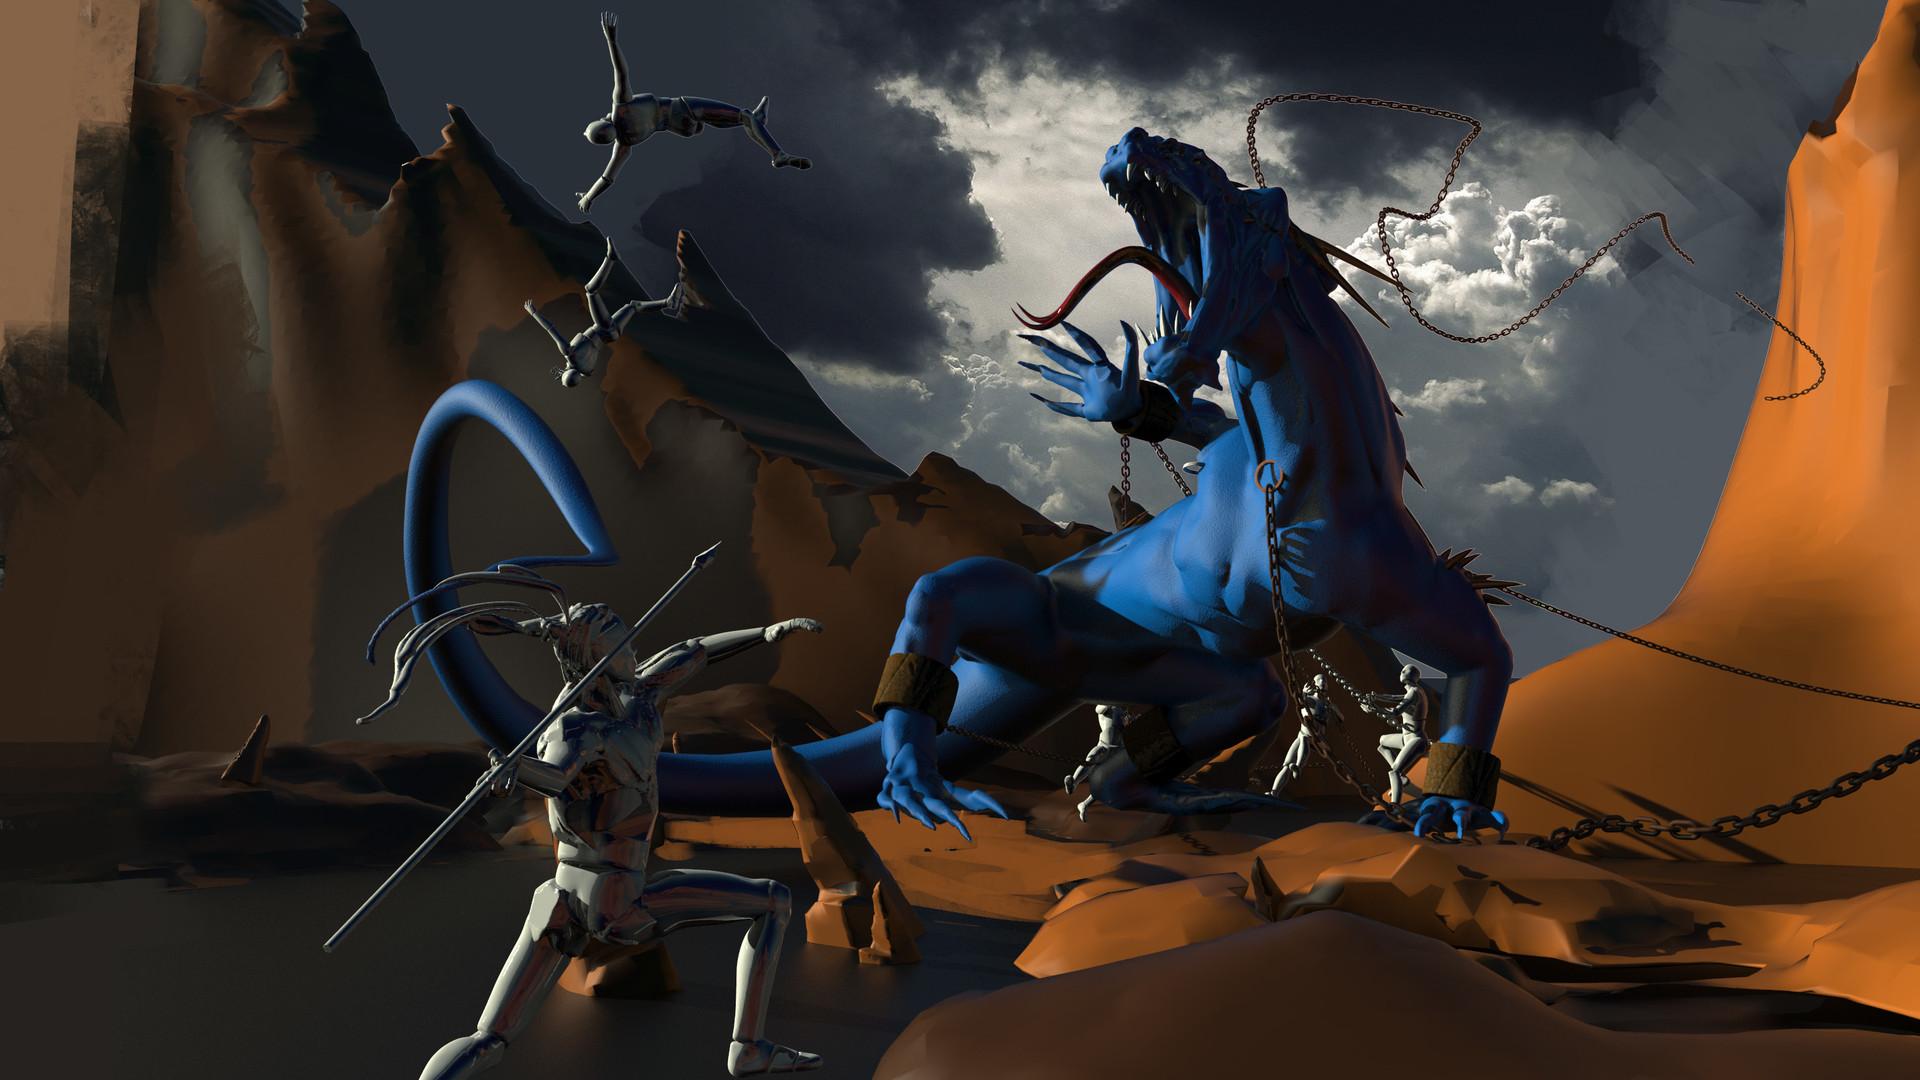 Nikolay karelin dragon1 54